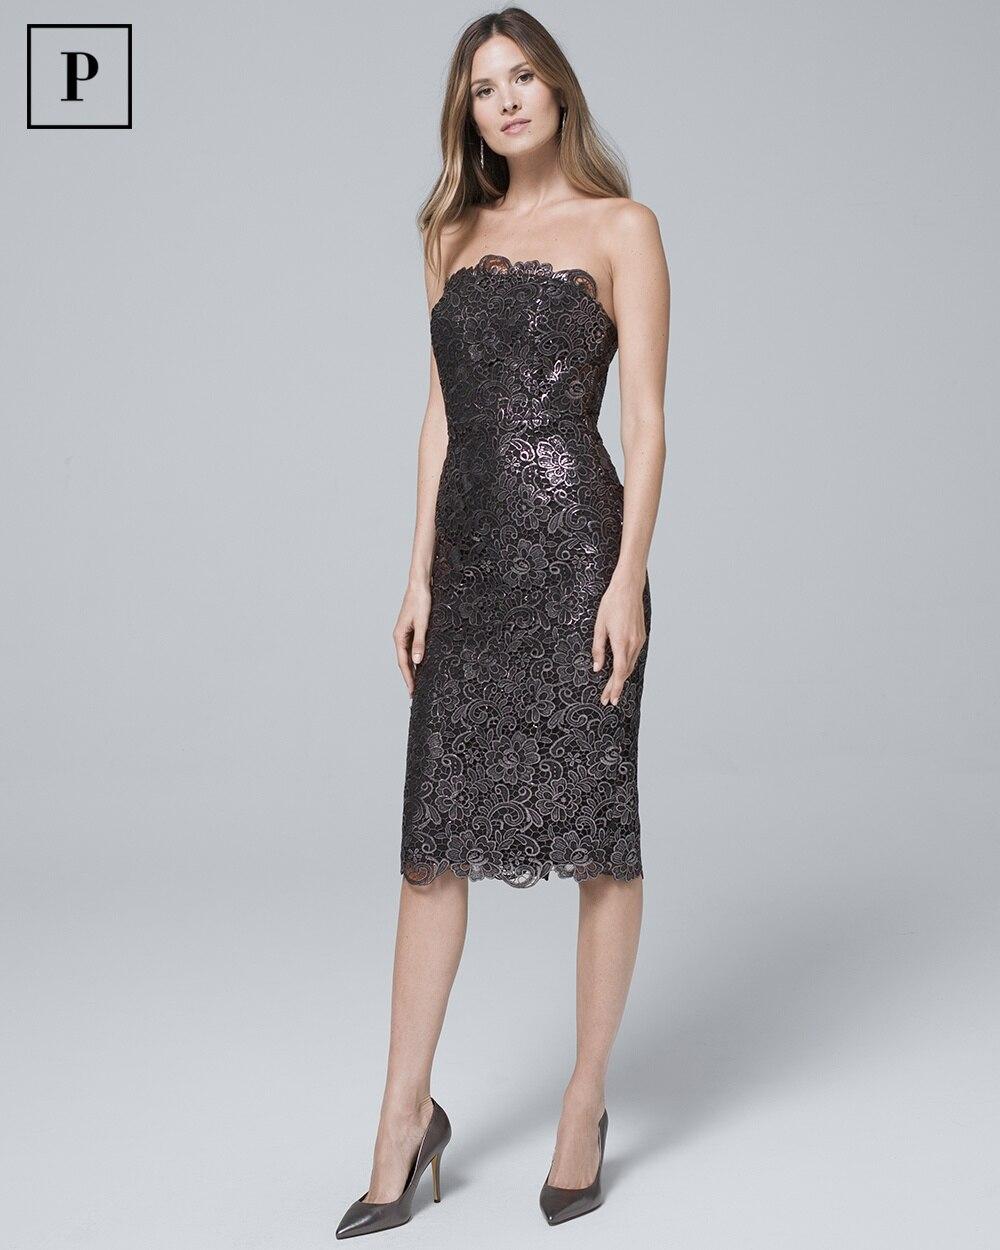 c905860c950 Petite Strapless Metallic Lace Sheath Dress - Shop Petite Dresses For Women  - Sheath